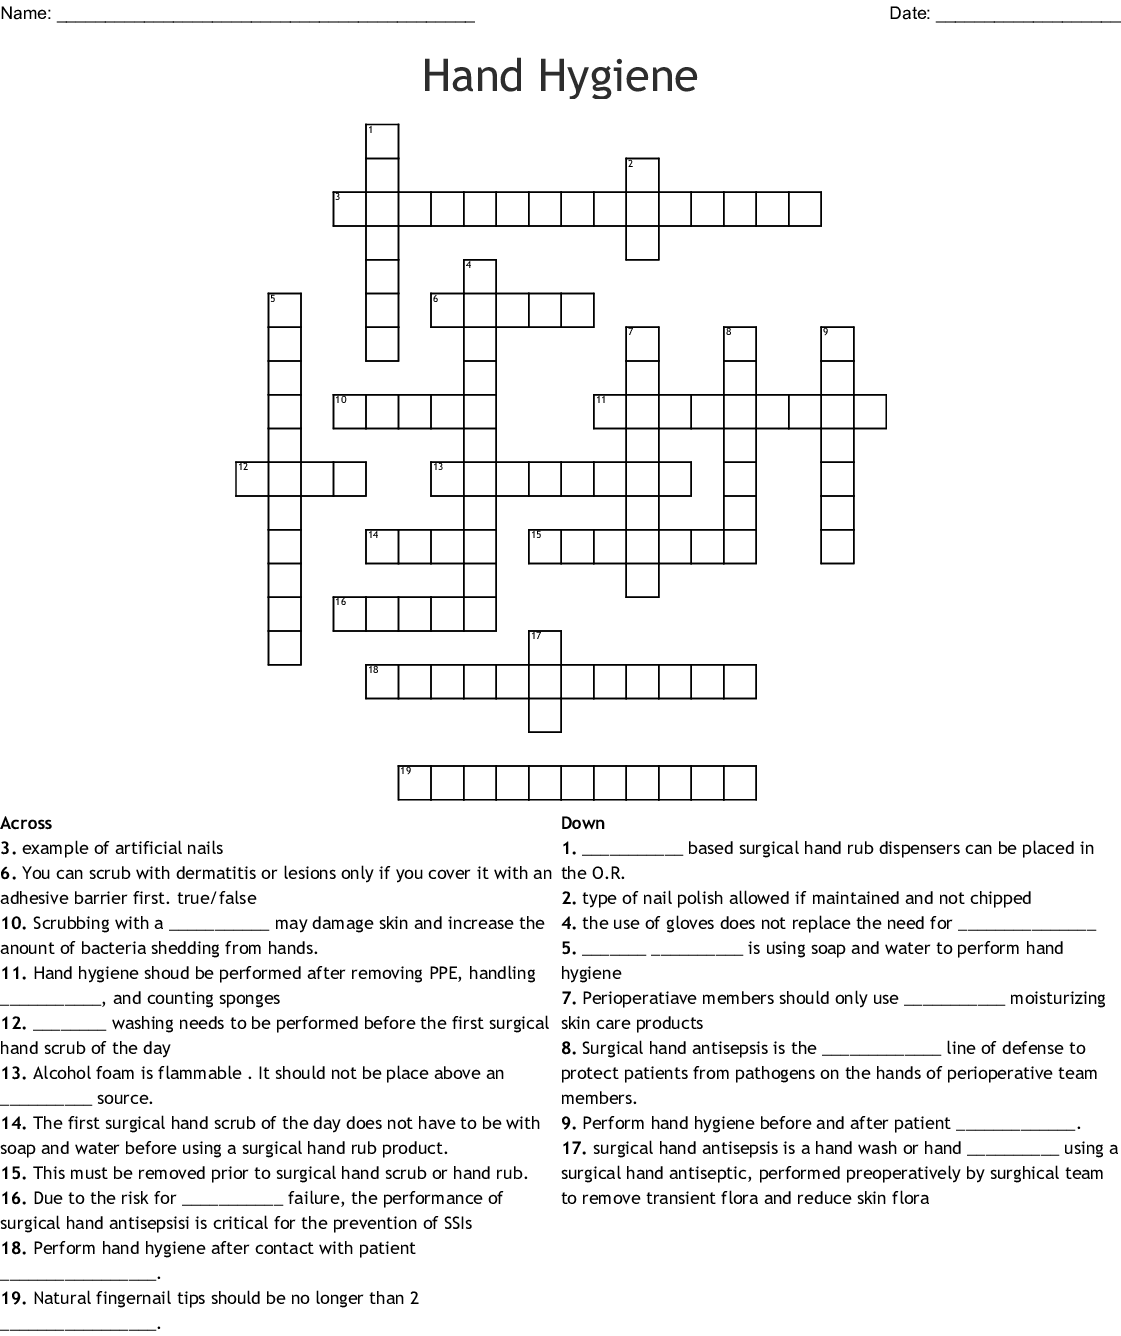 Hand Hygiene Crossword